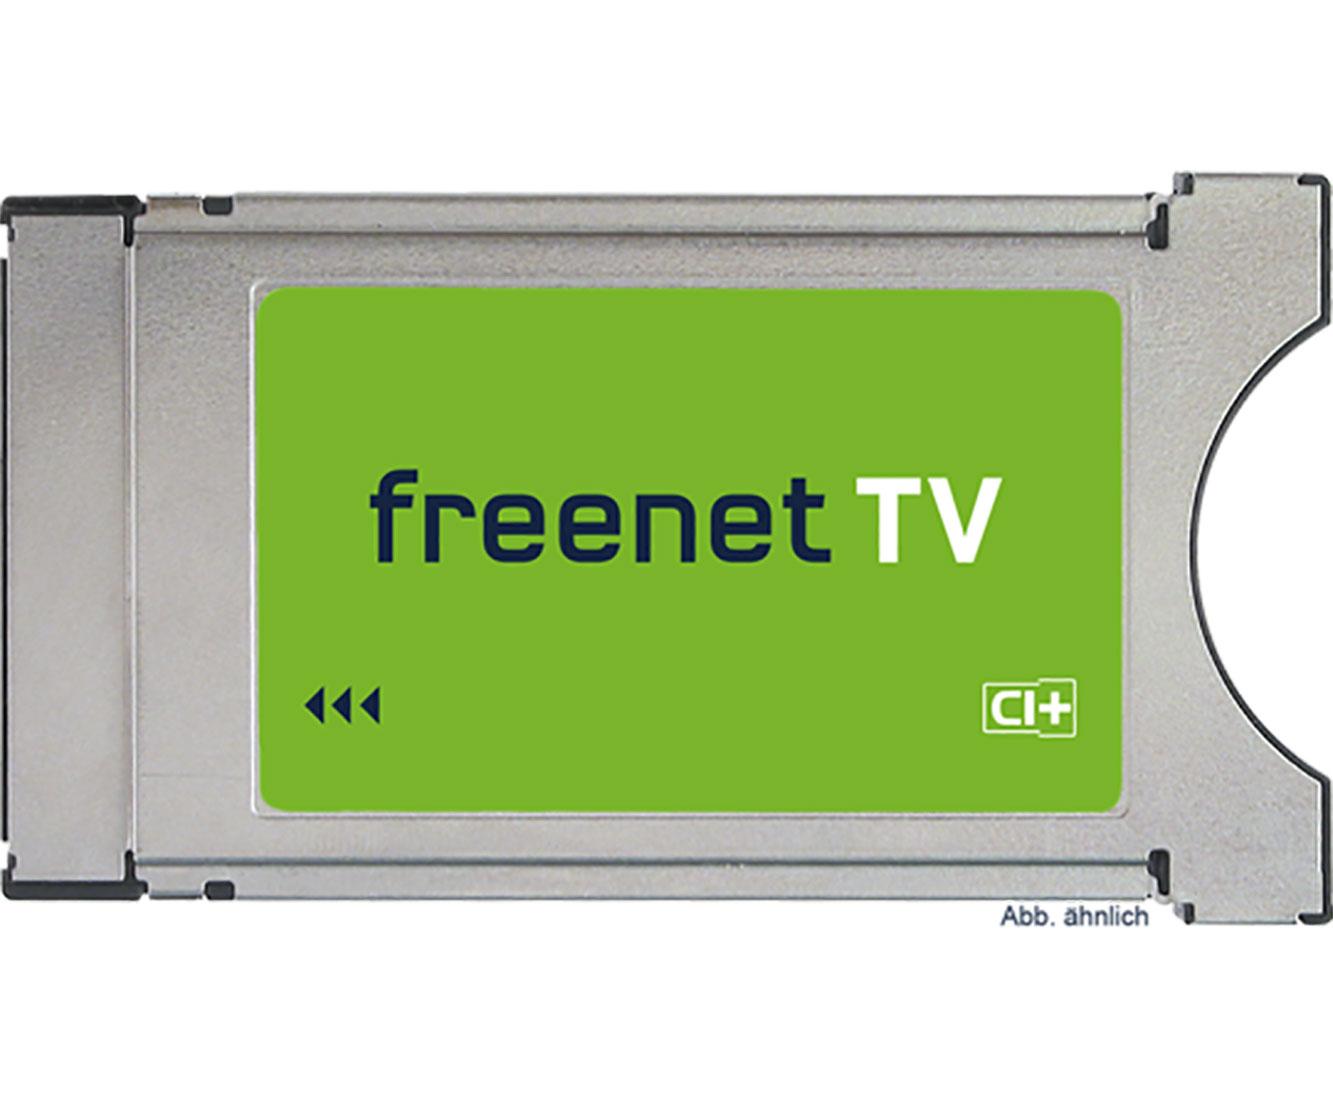 freenet freenet TV CI+ Modul Zubehör - Edelstahl